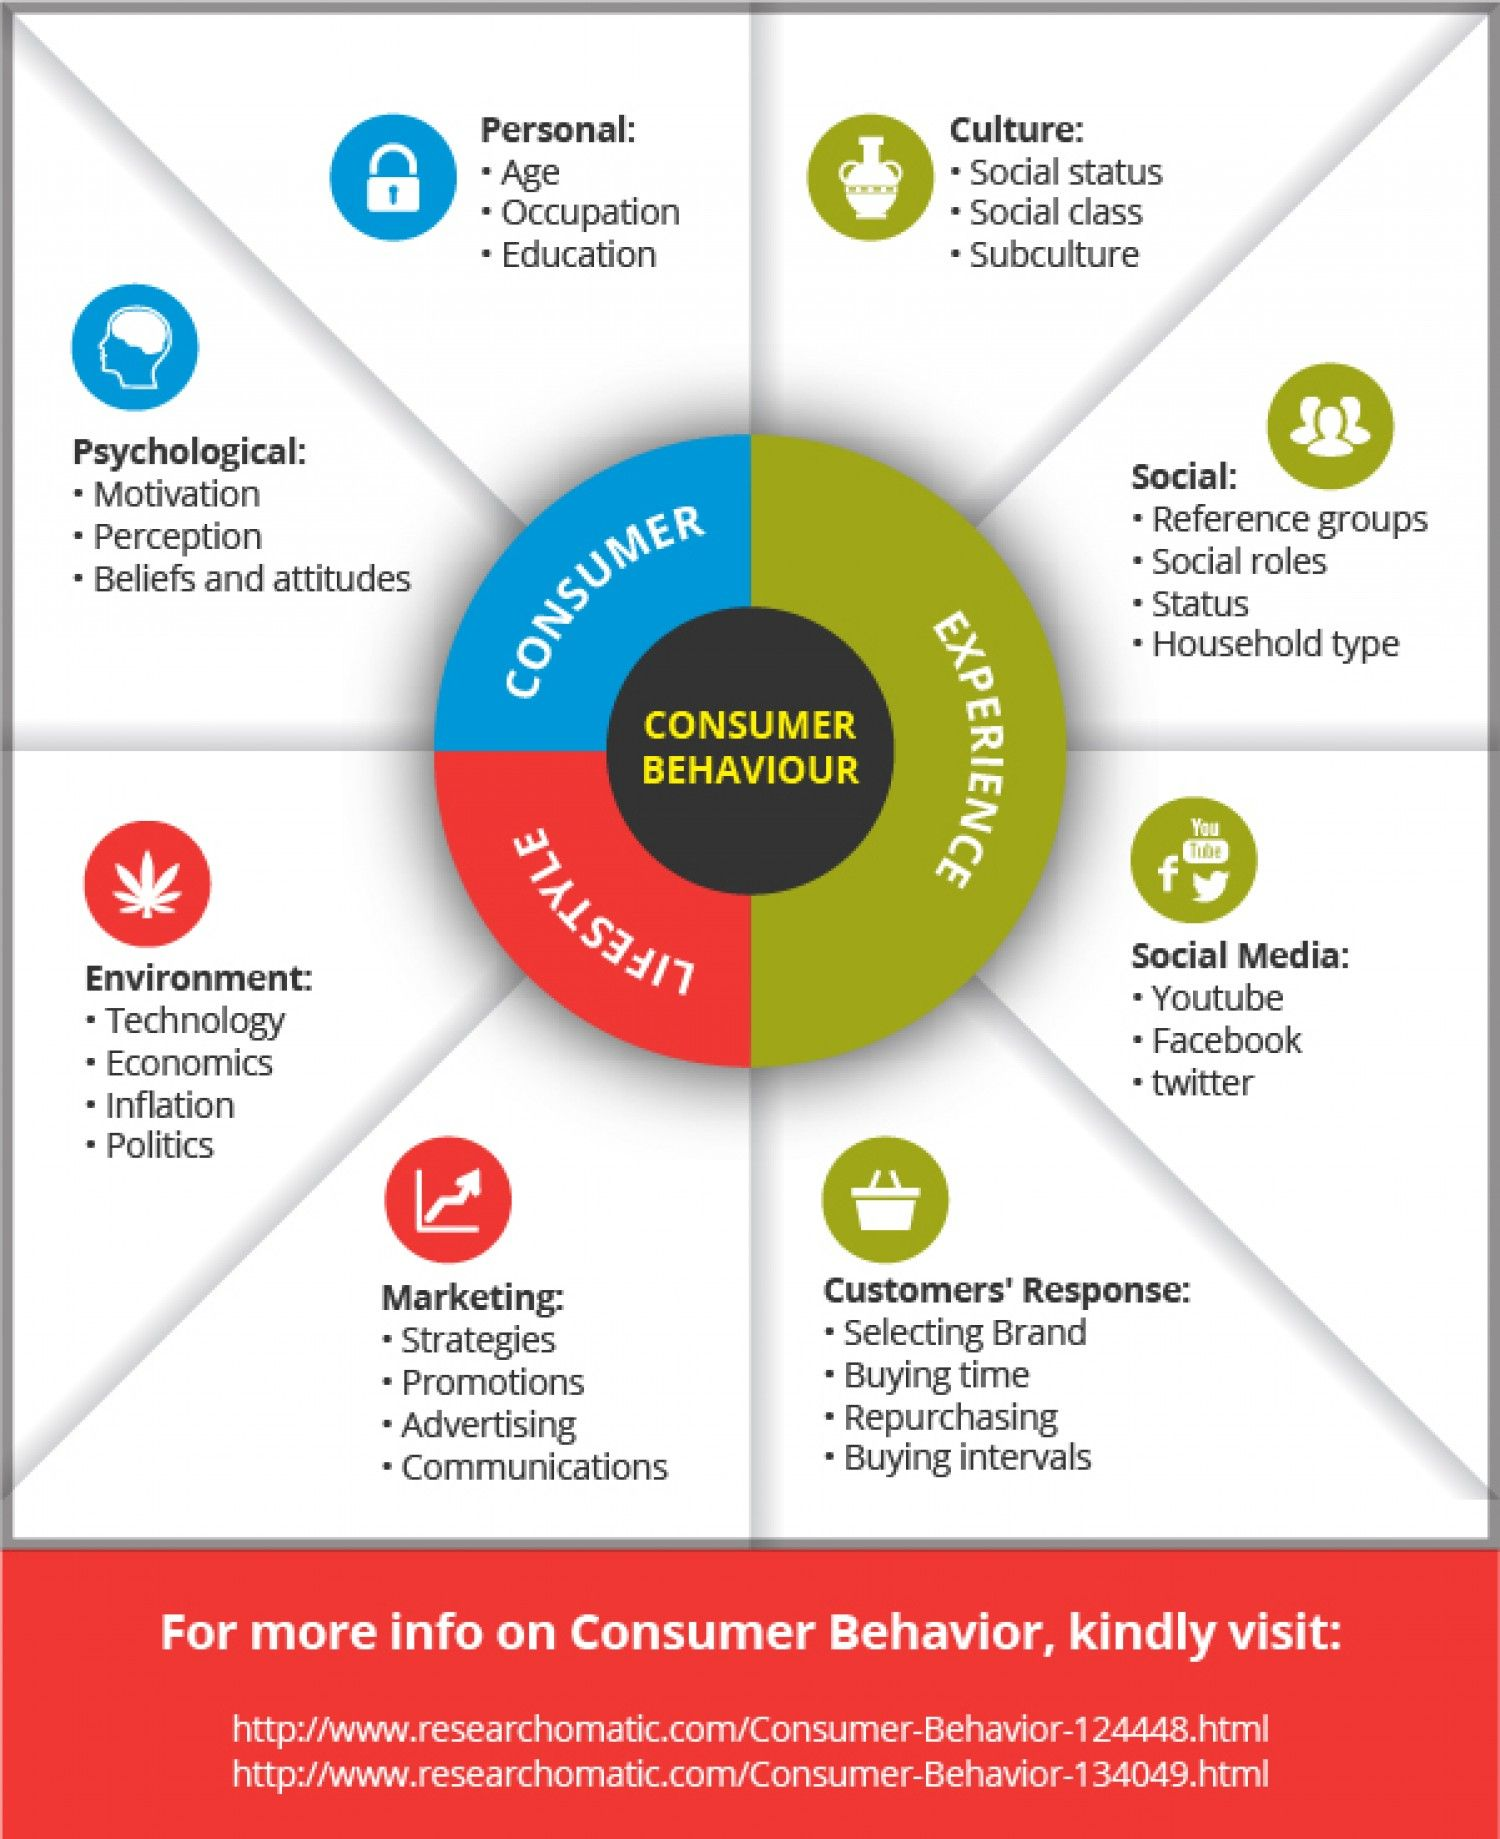 Consumer Behavior Infographic